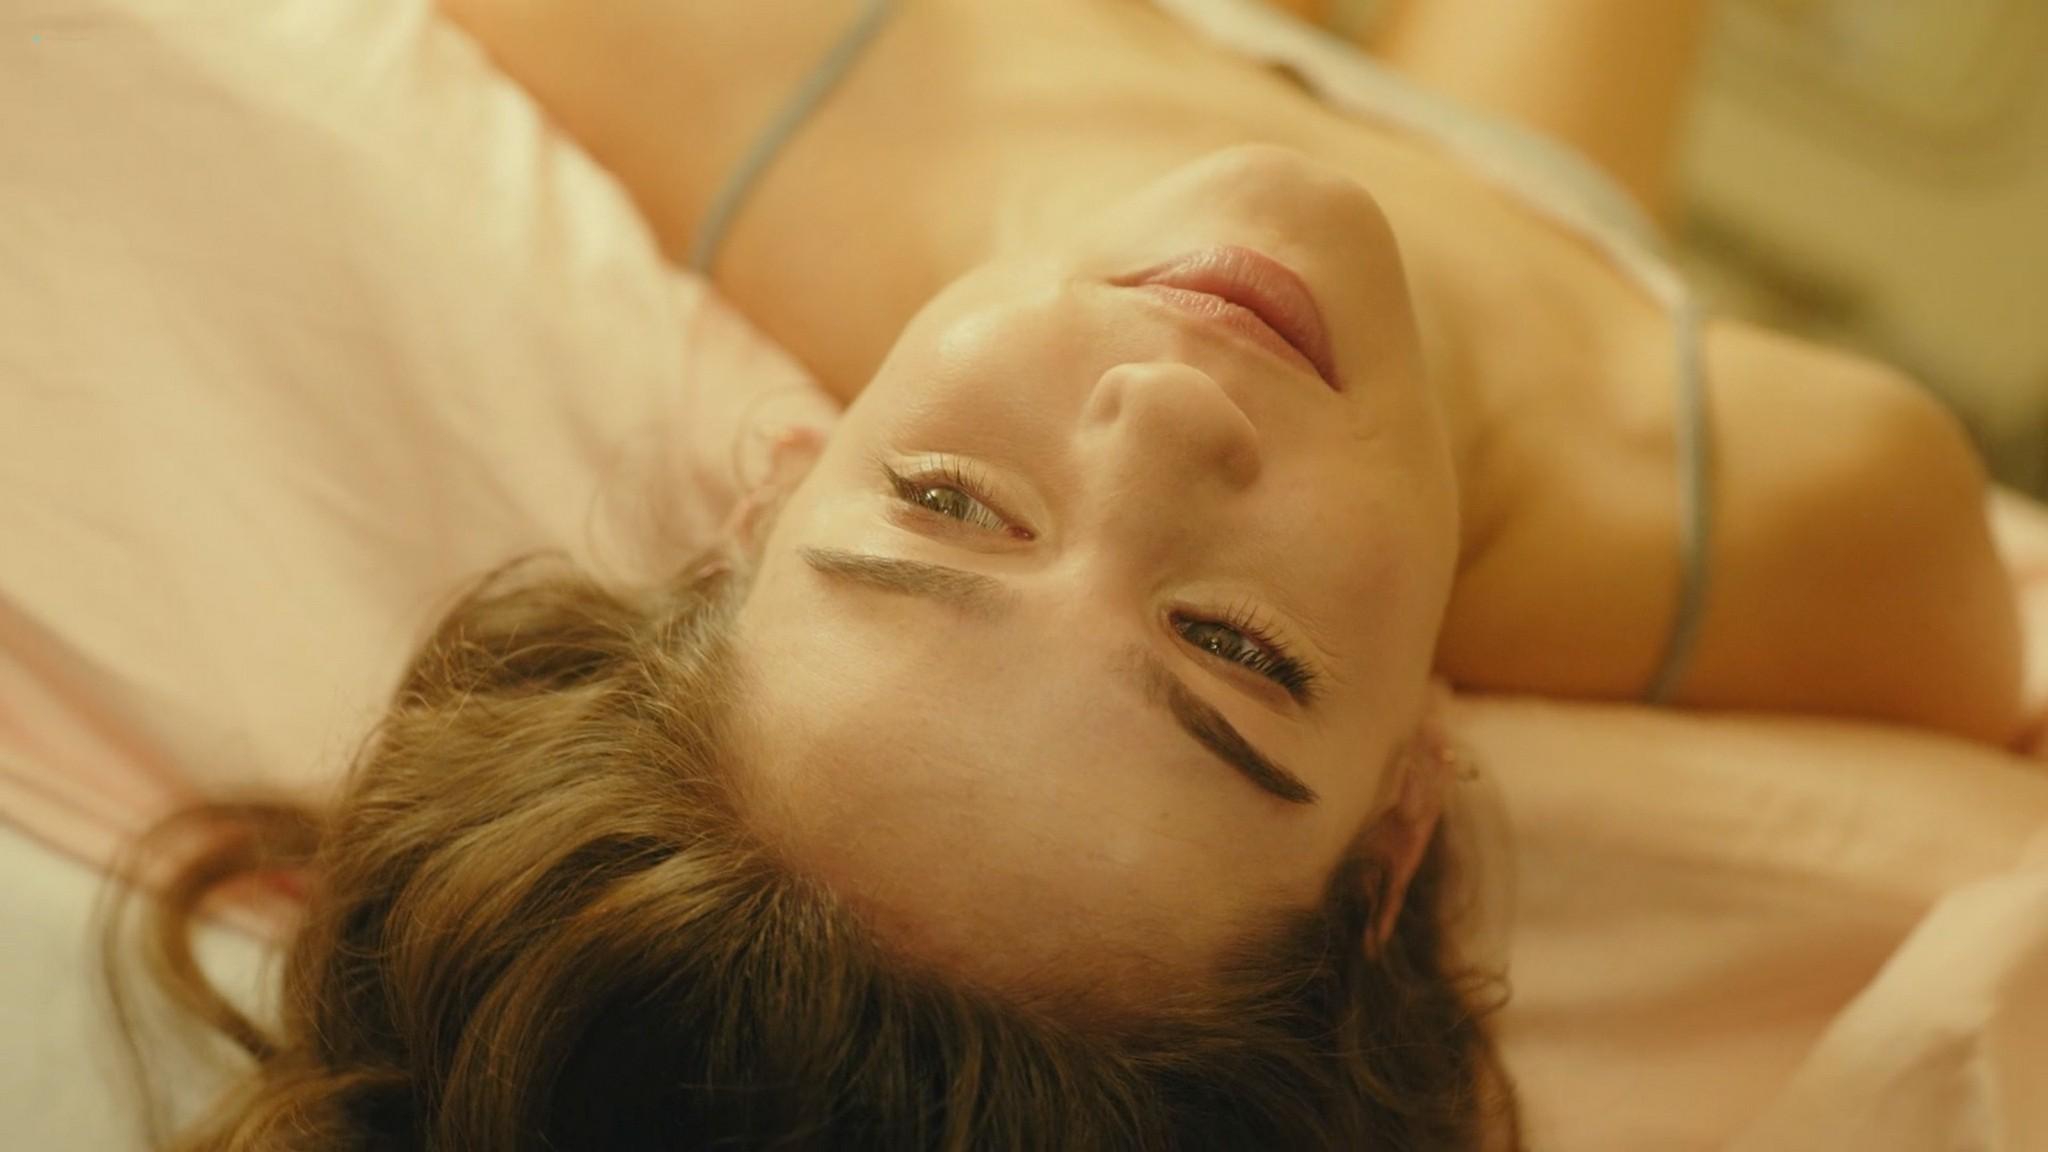 Matilda Anna Ingrid Lutz hot and sexy Rings 2017 1080p BluRay 2